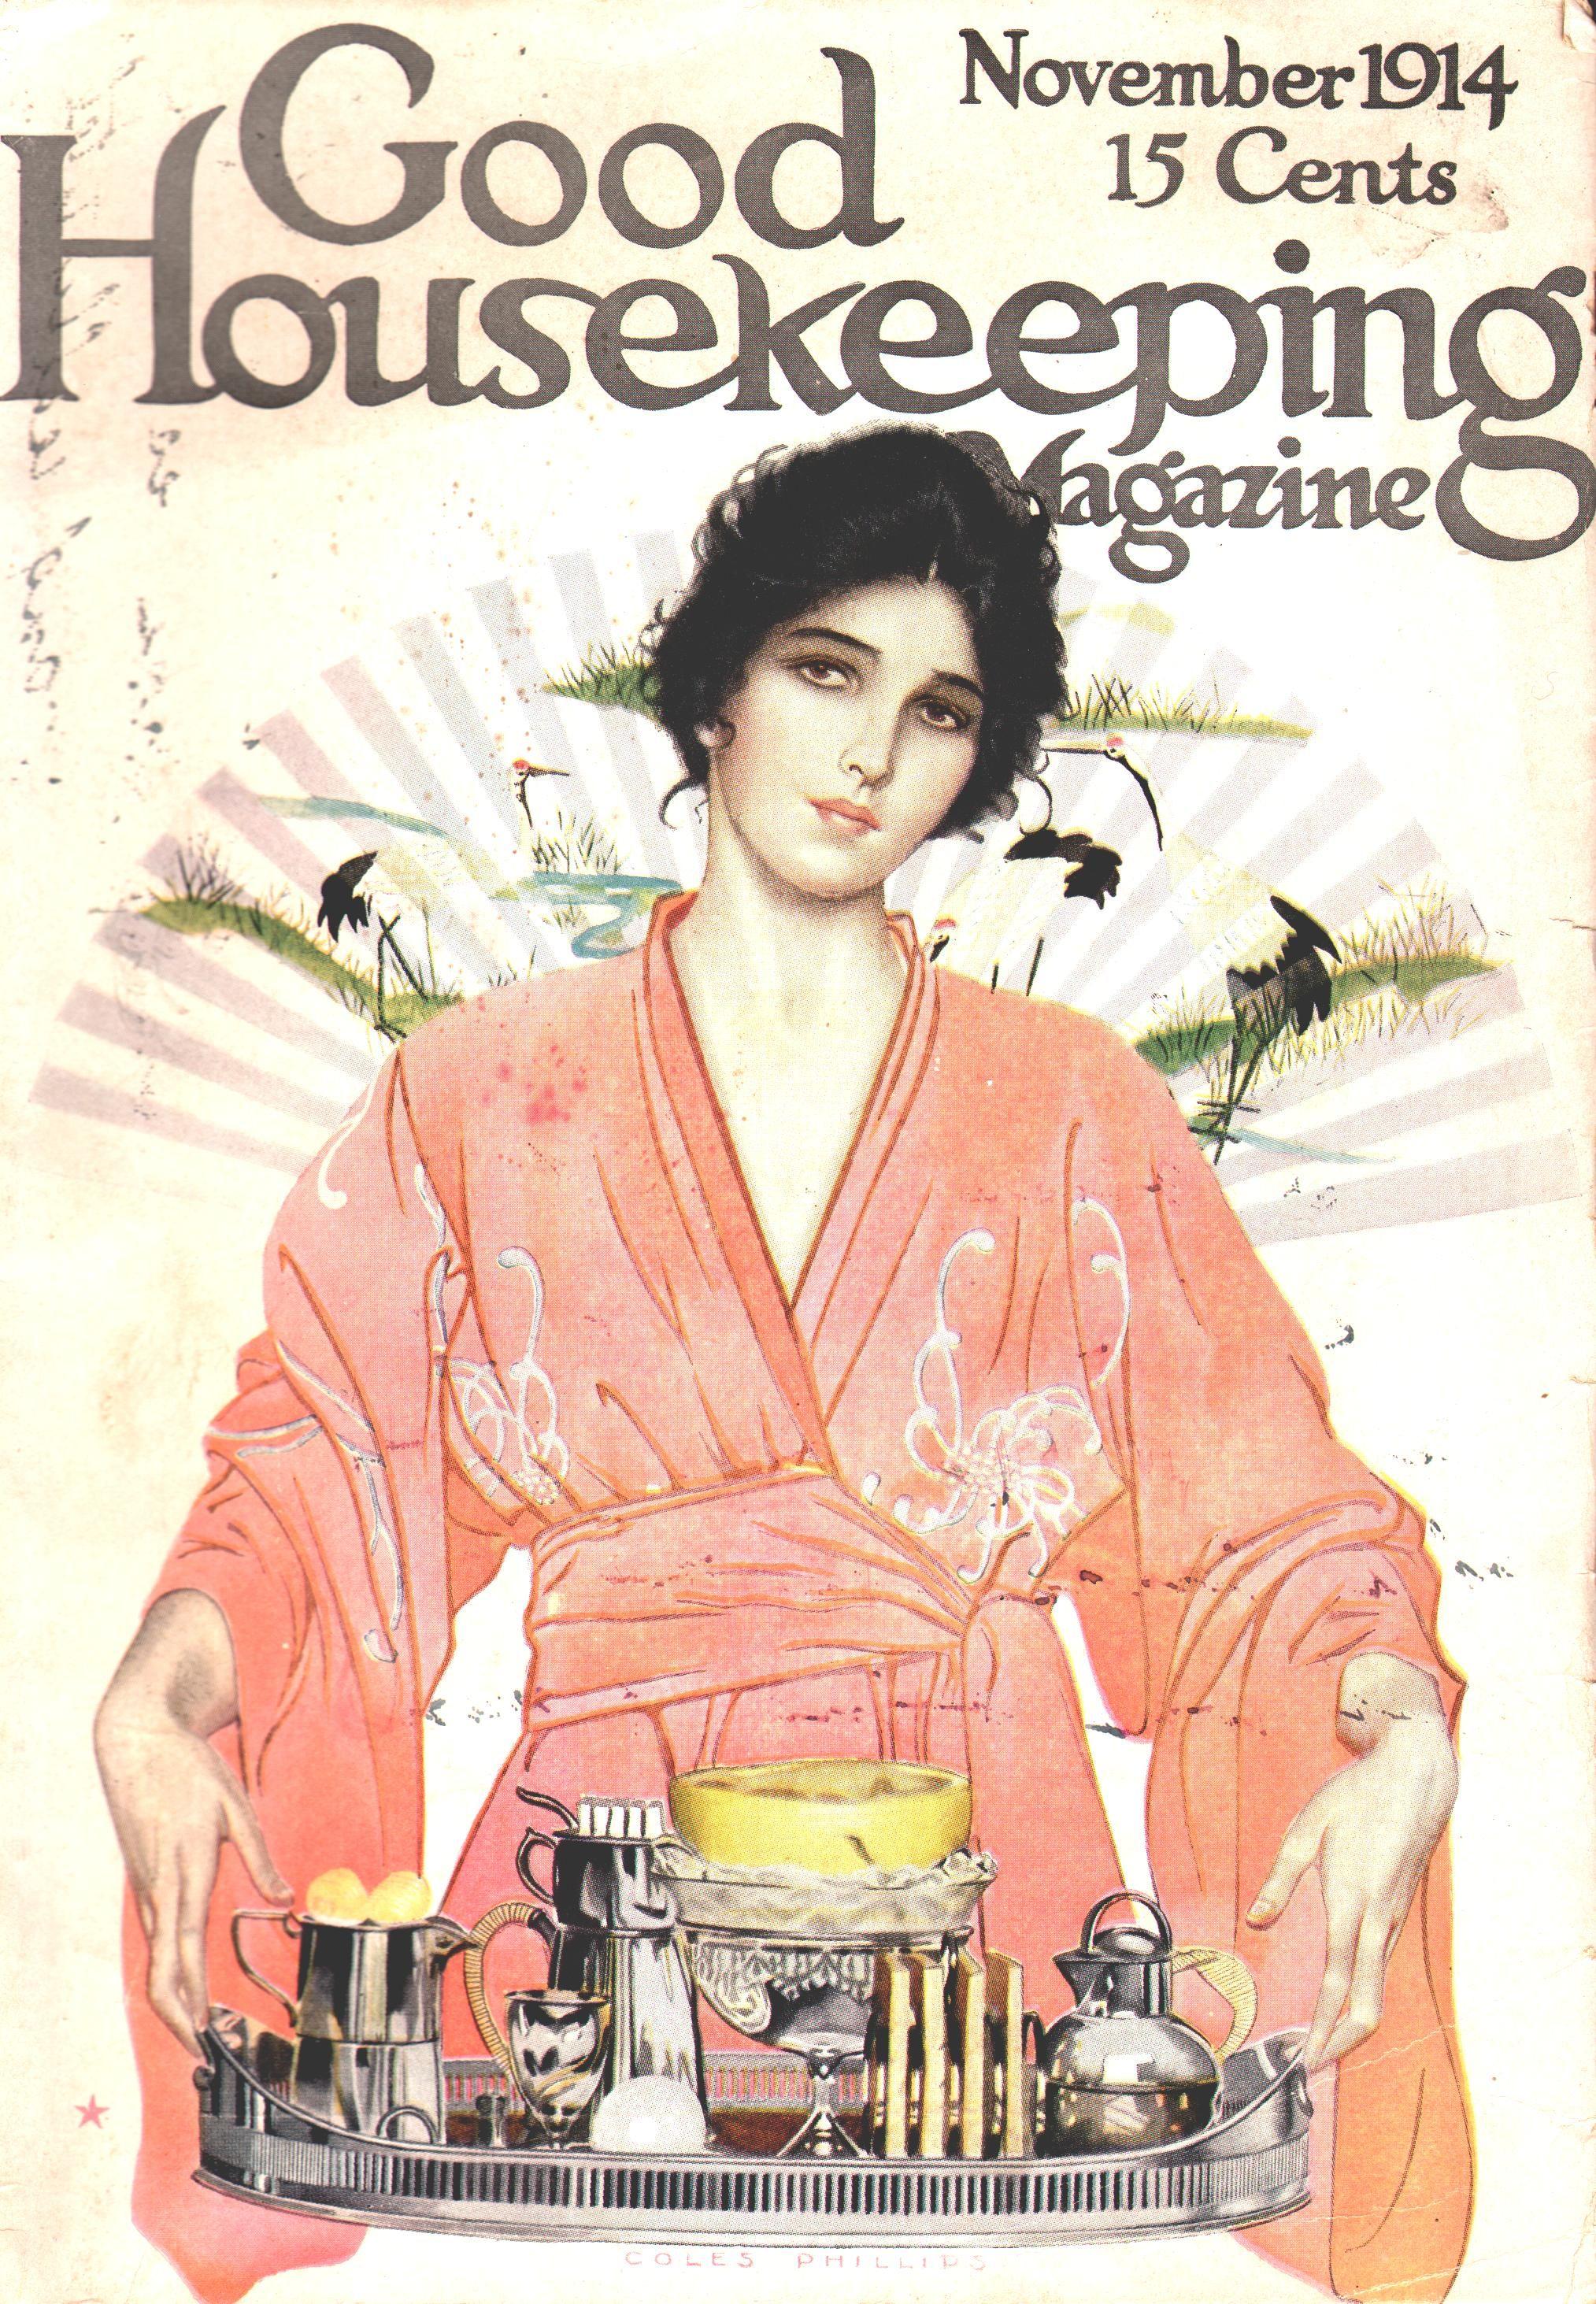 Coles Phillips - Good Housekeeping Magazine cover (November 1914)